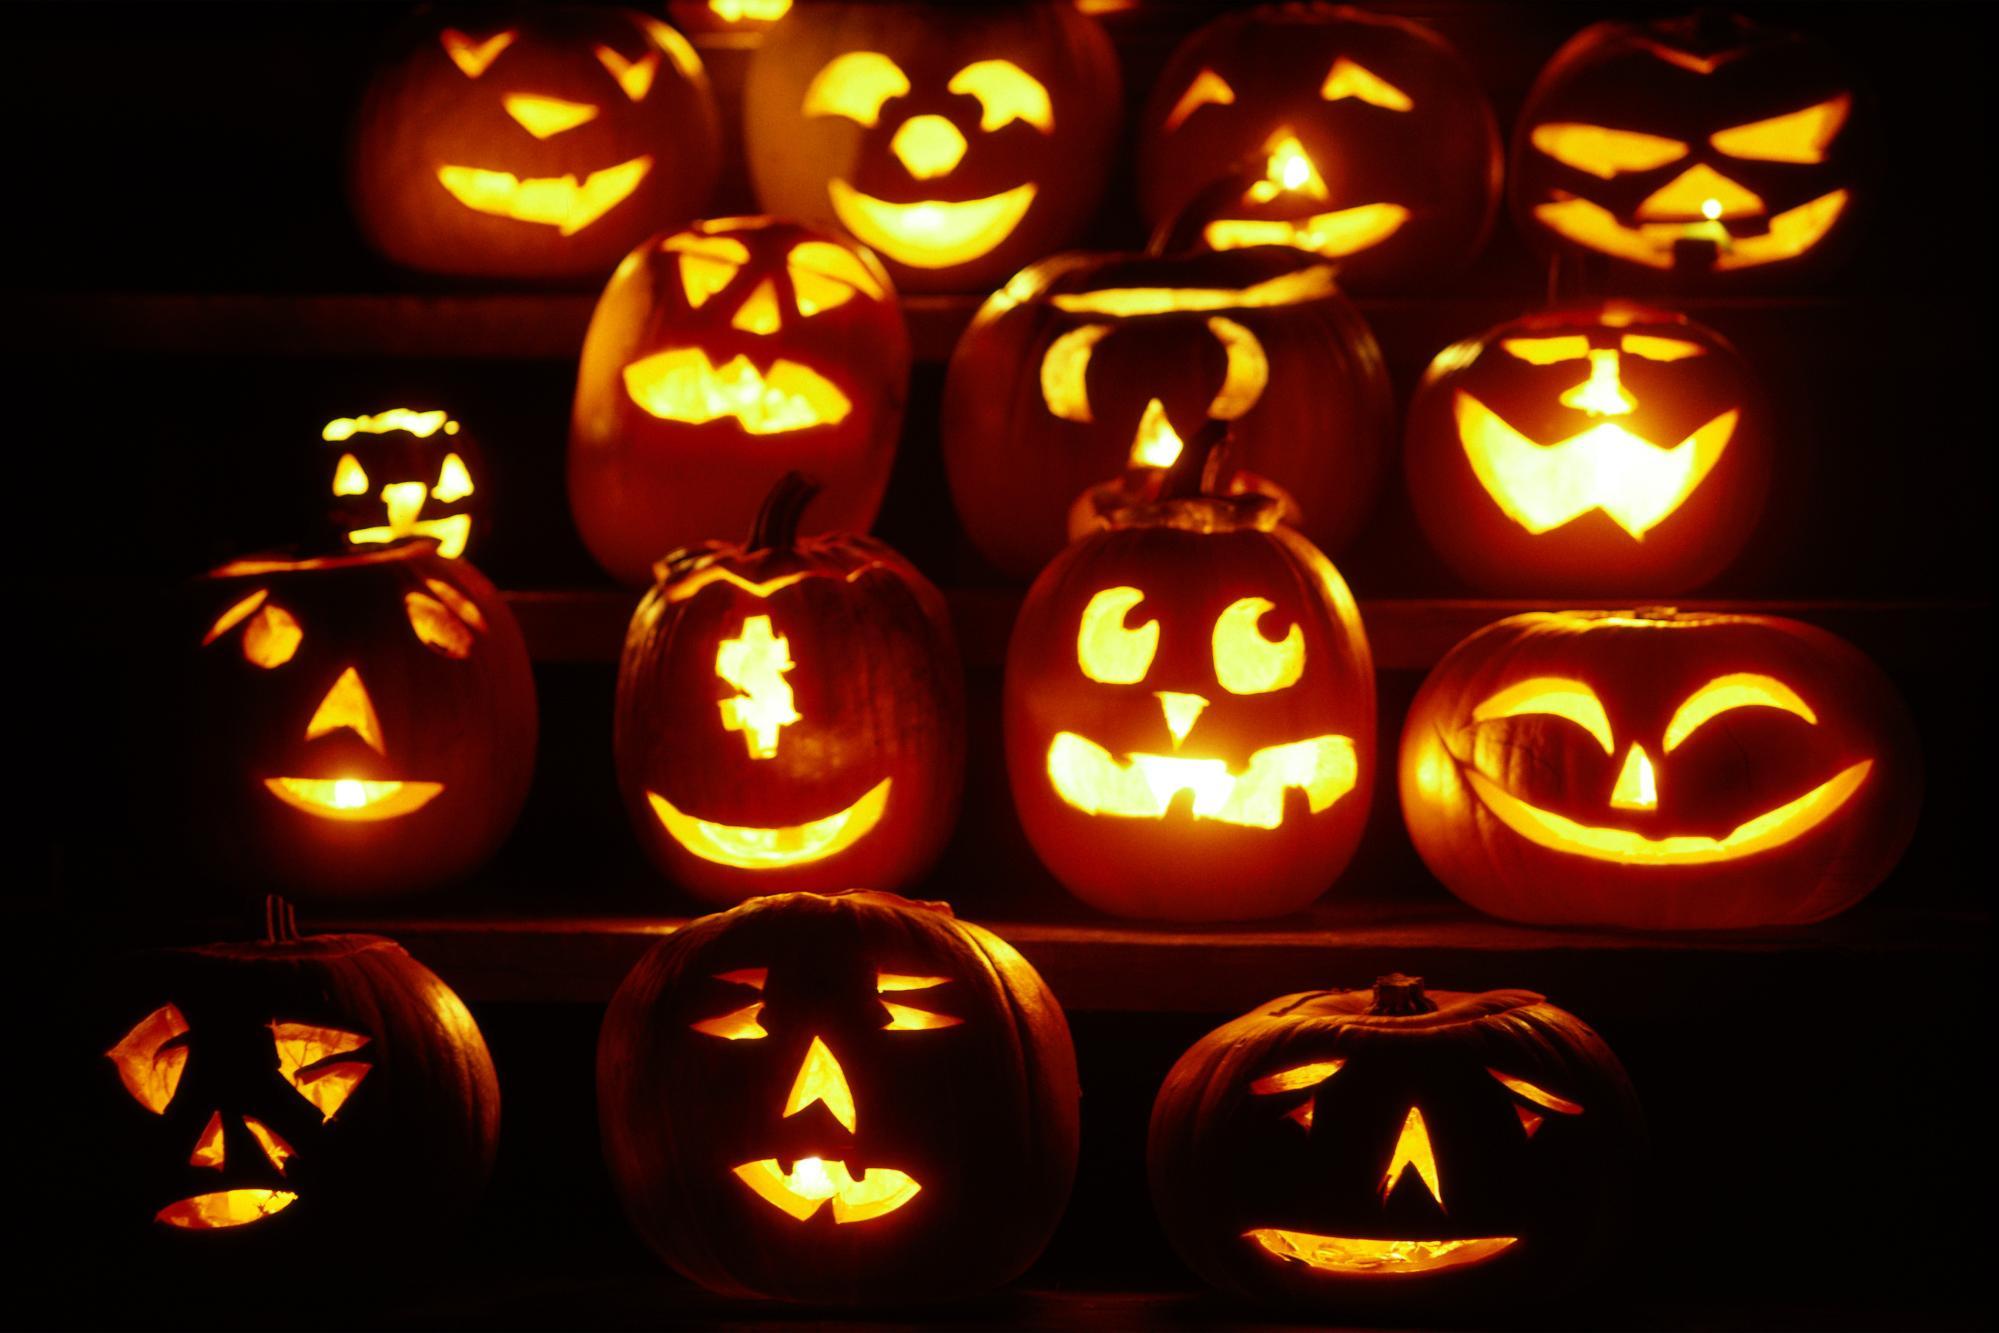 pumpkin screensaver 1999x1333